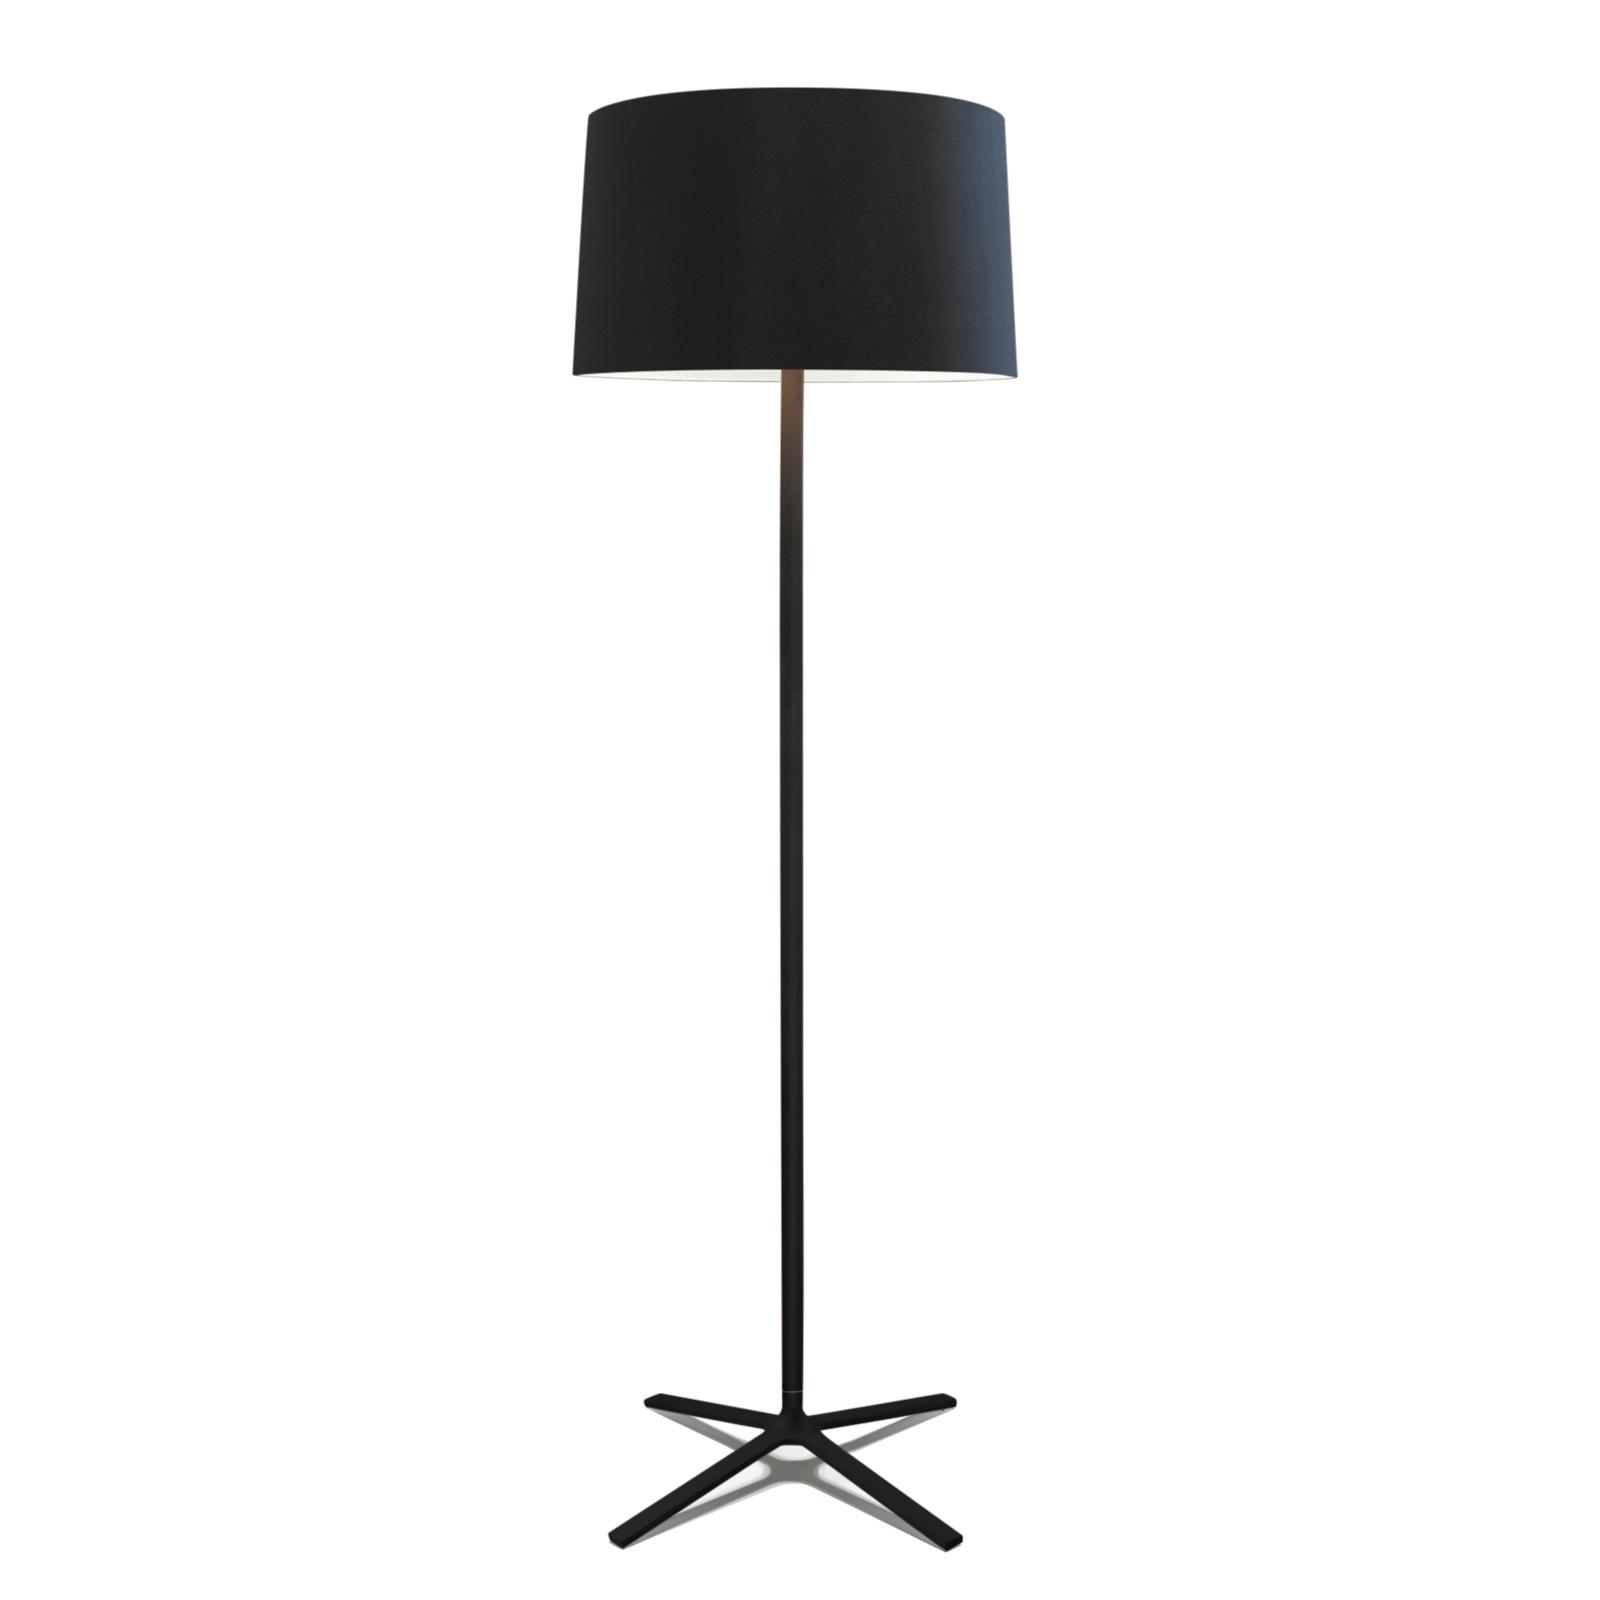 Grok Hall lampadaire avec abat-jour en tissu, noir